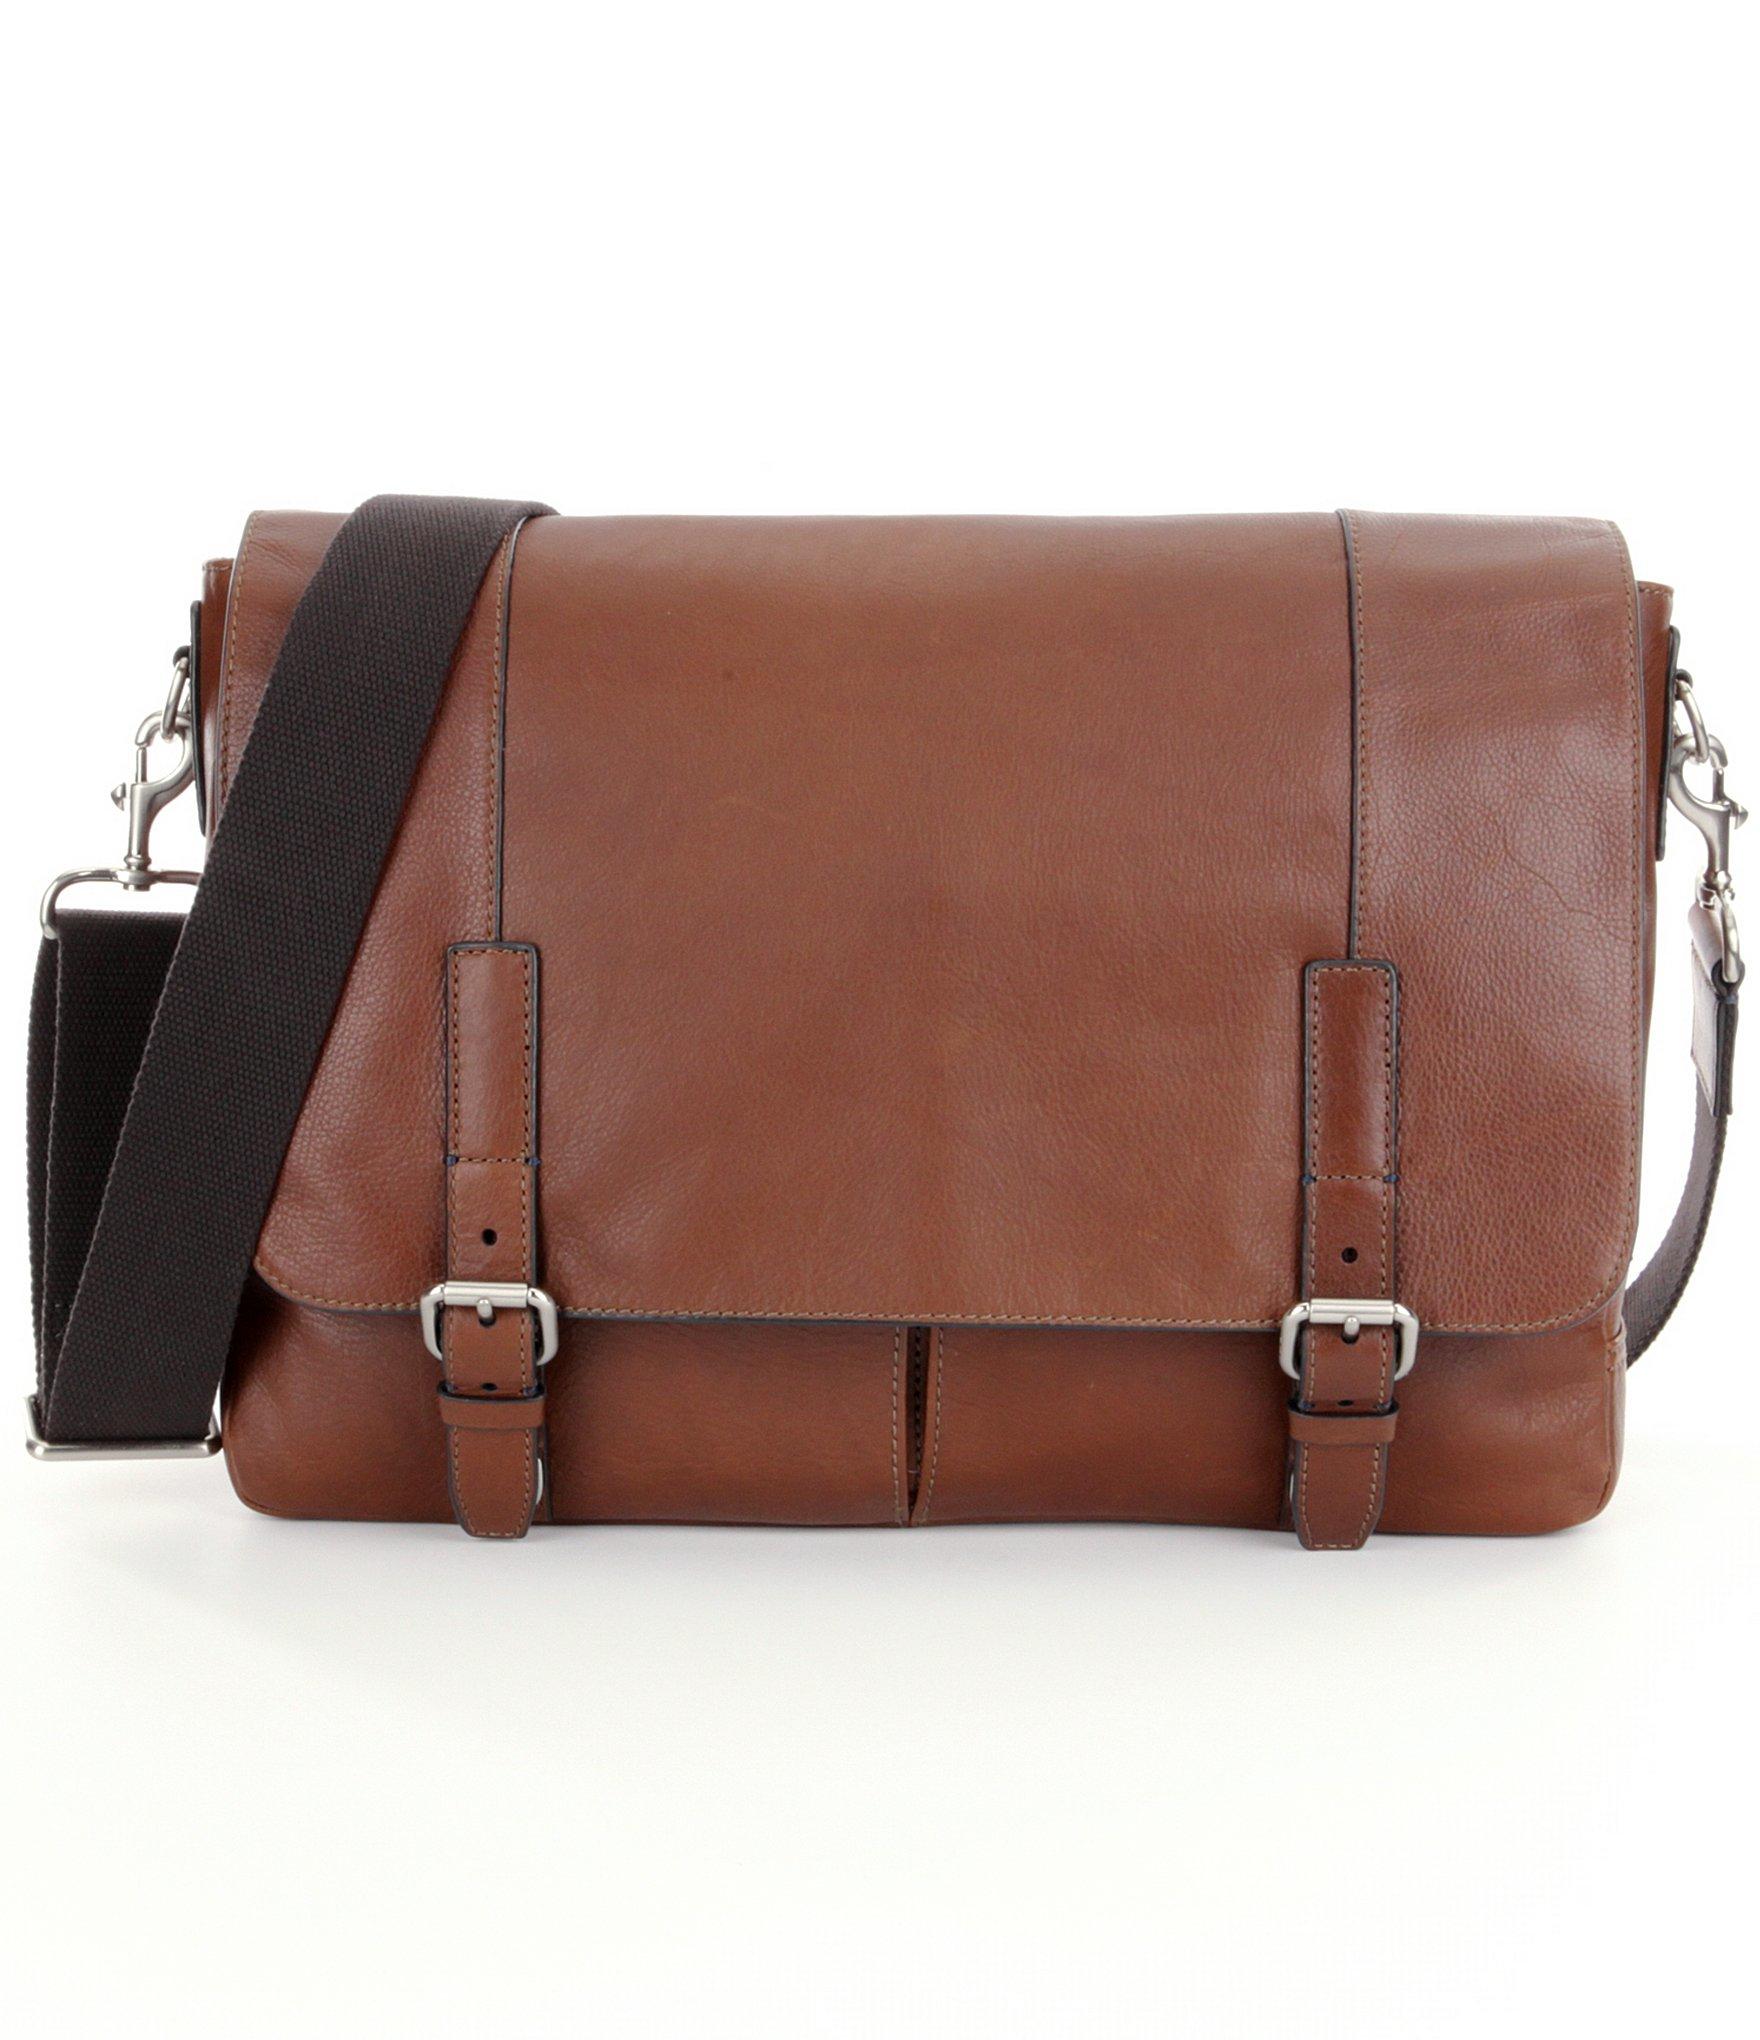 Elegant Fossil Defender Brown Messenger Bag Ladies Handbags